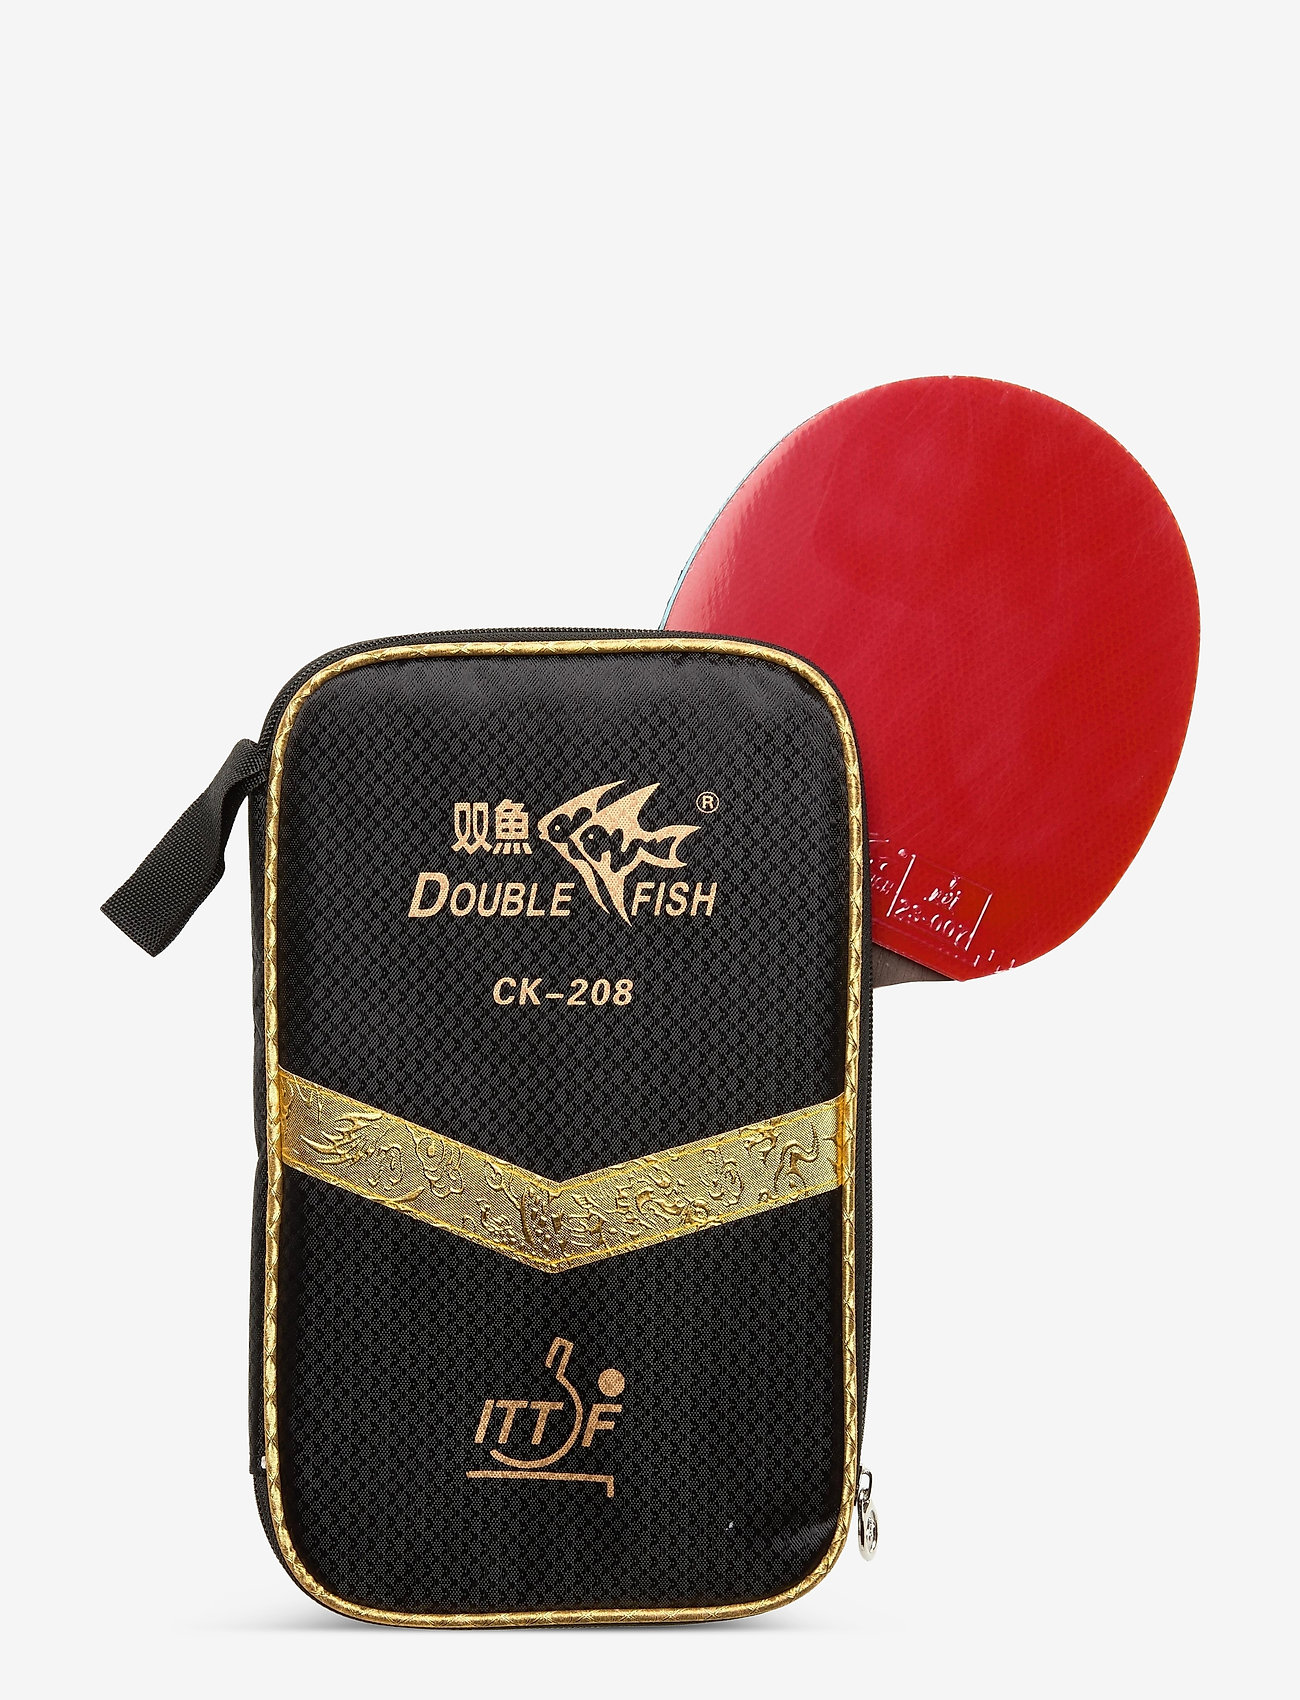 Double Fish - CK-208 Tournament Table Tennis Racket - bordtennisbat - 1001 black - 0